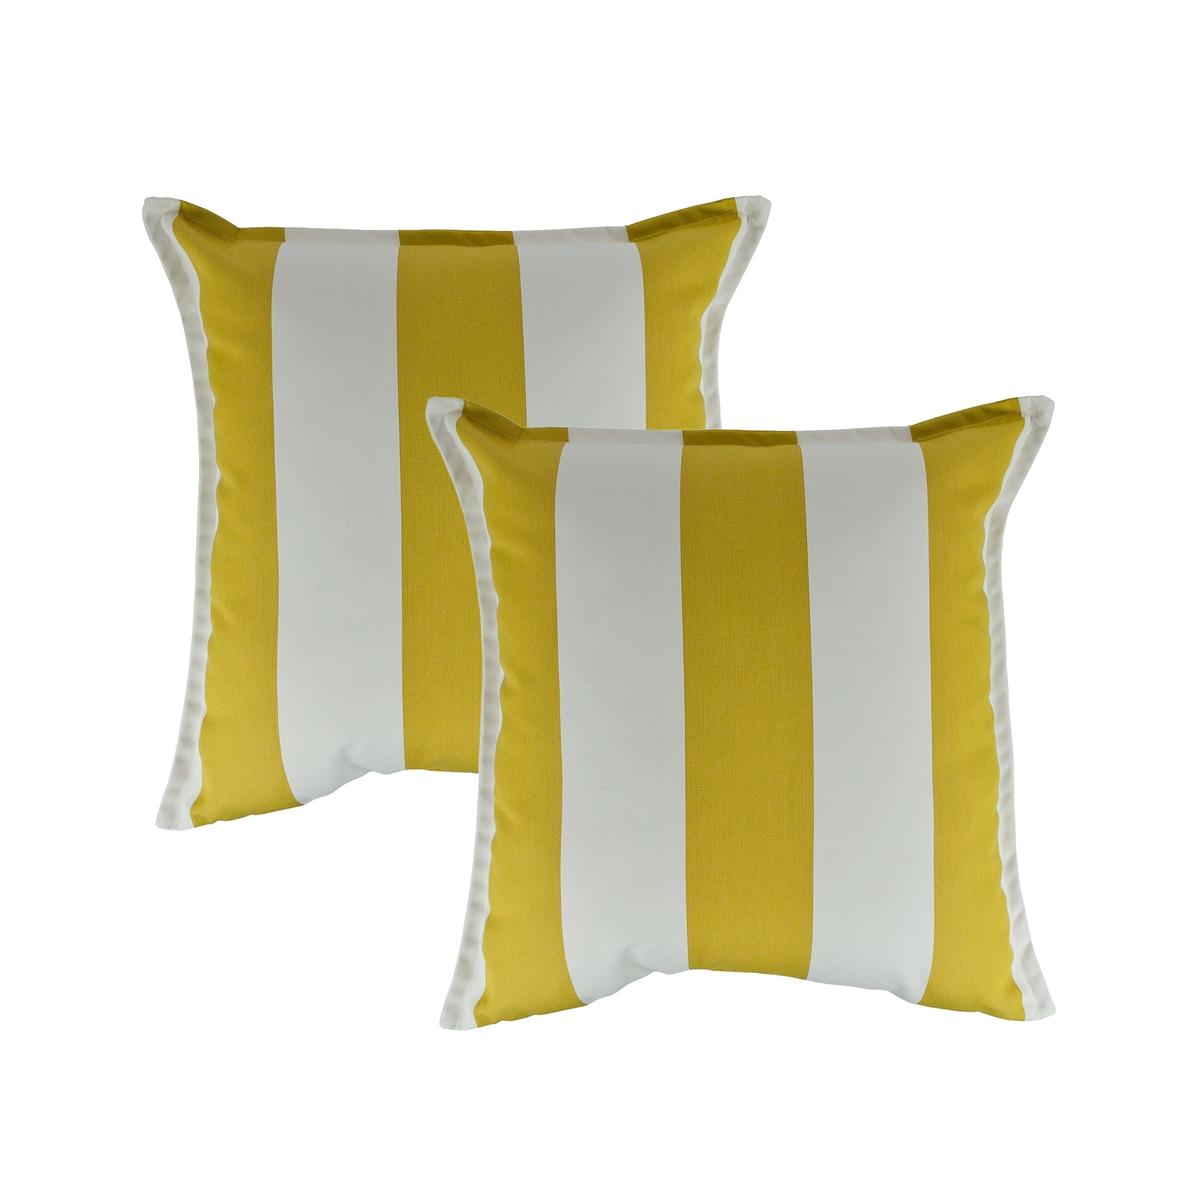 Sunbrella 18 X 18 Inch Yellow White Stripe Outdoor Pillows Set Of 2